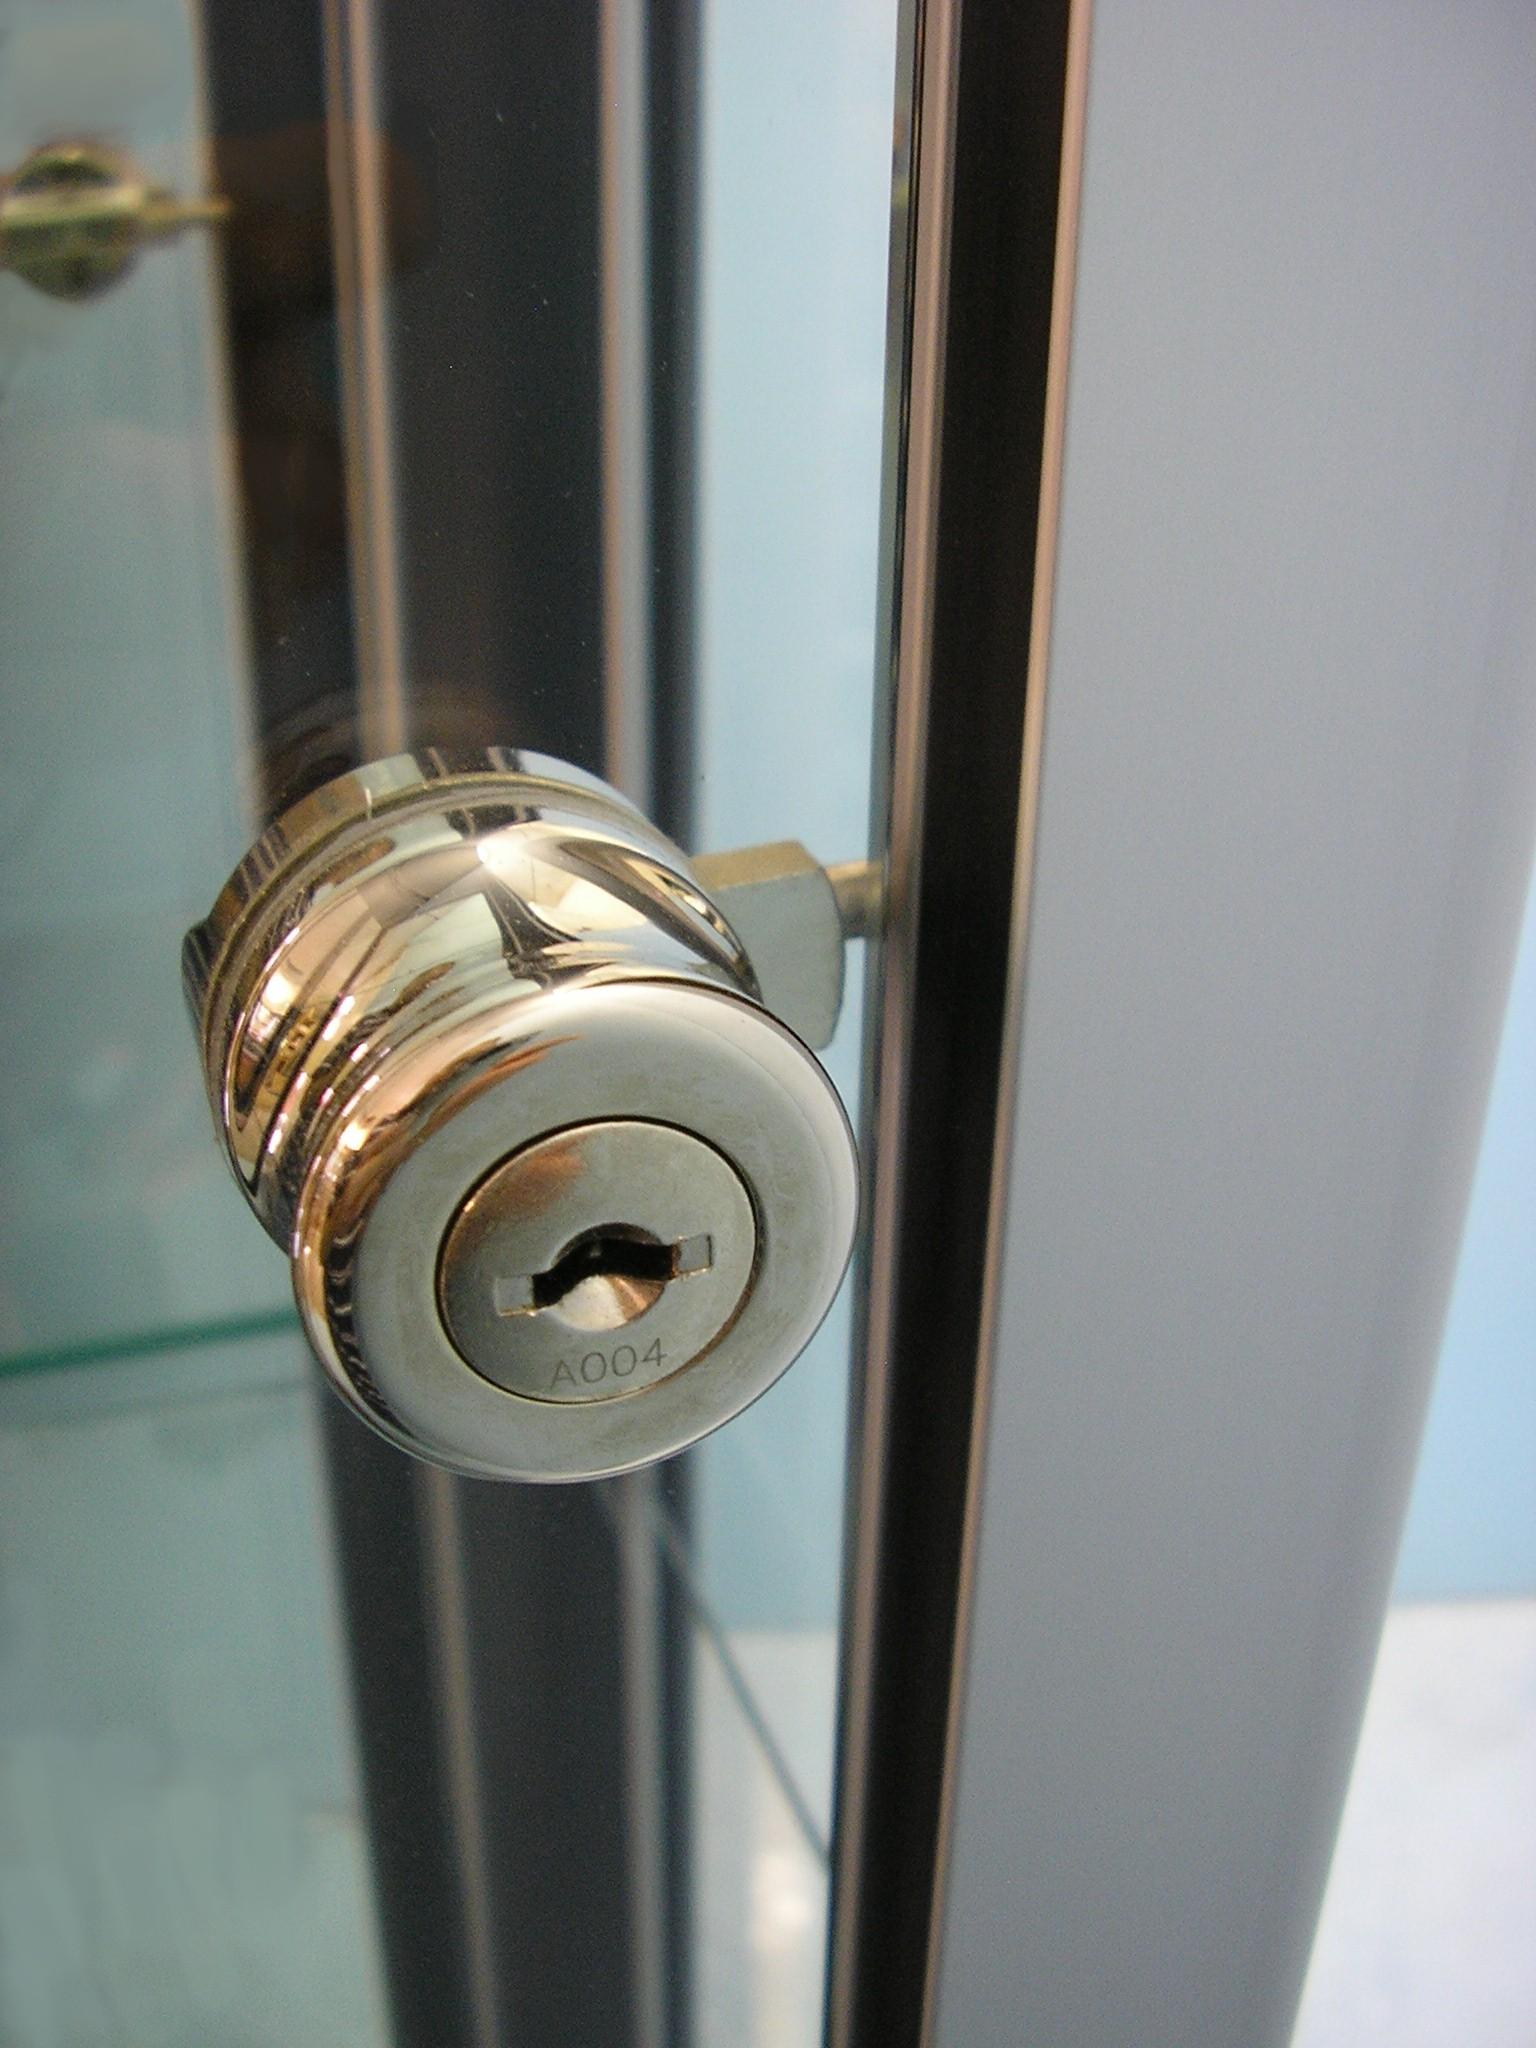 Designex Cabinets pin lock